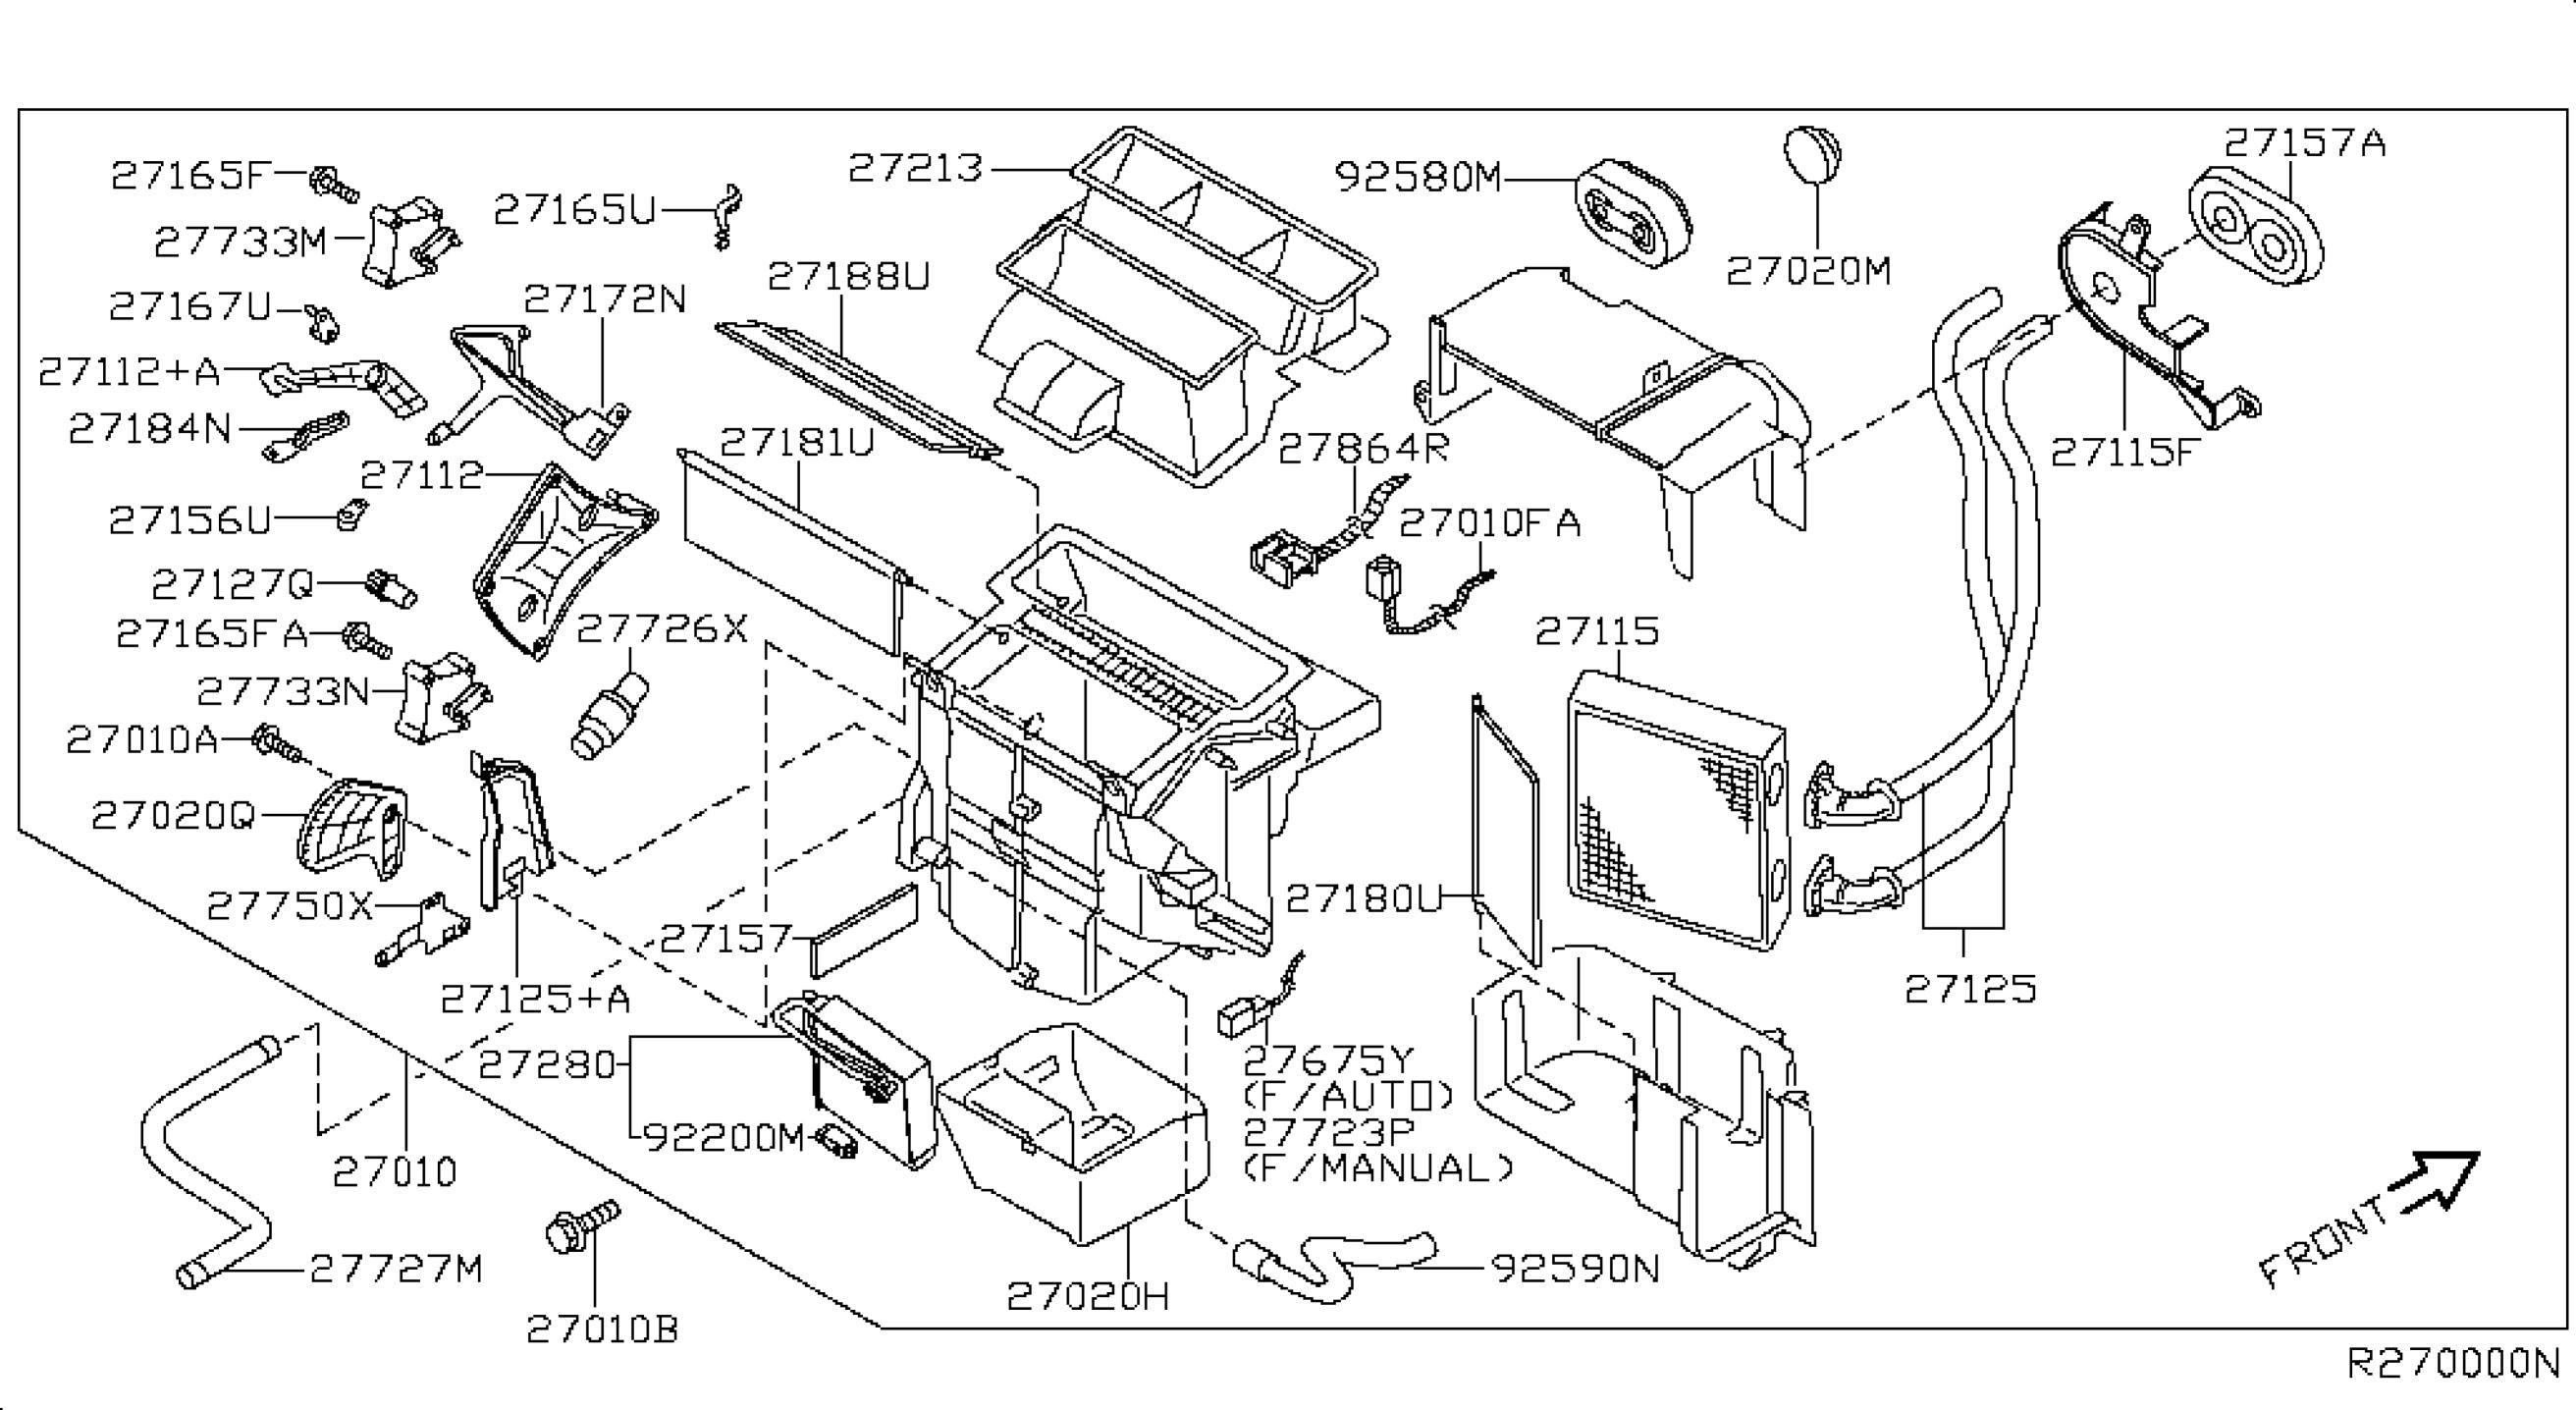 2000 Nissan Altima Engine Diagram 2003 Nissan Altima Exhaust System Diagram Moreover 2000 Nissan Of 2000 Nissan Altima Engine Diagram